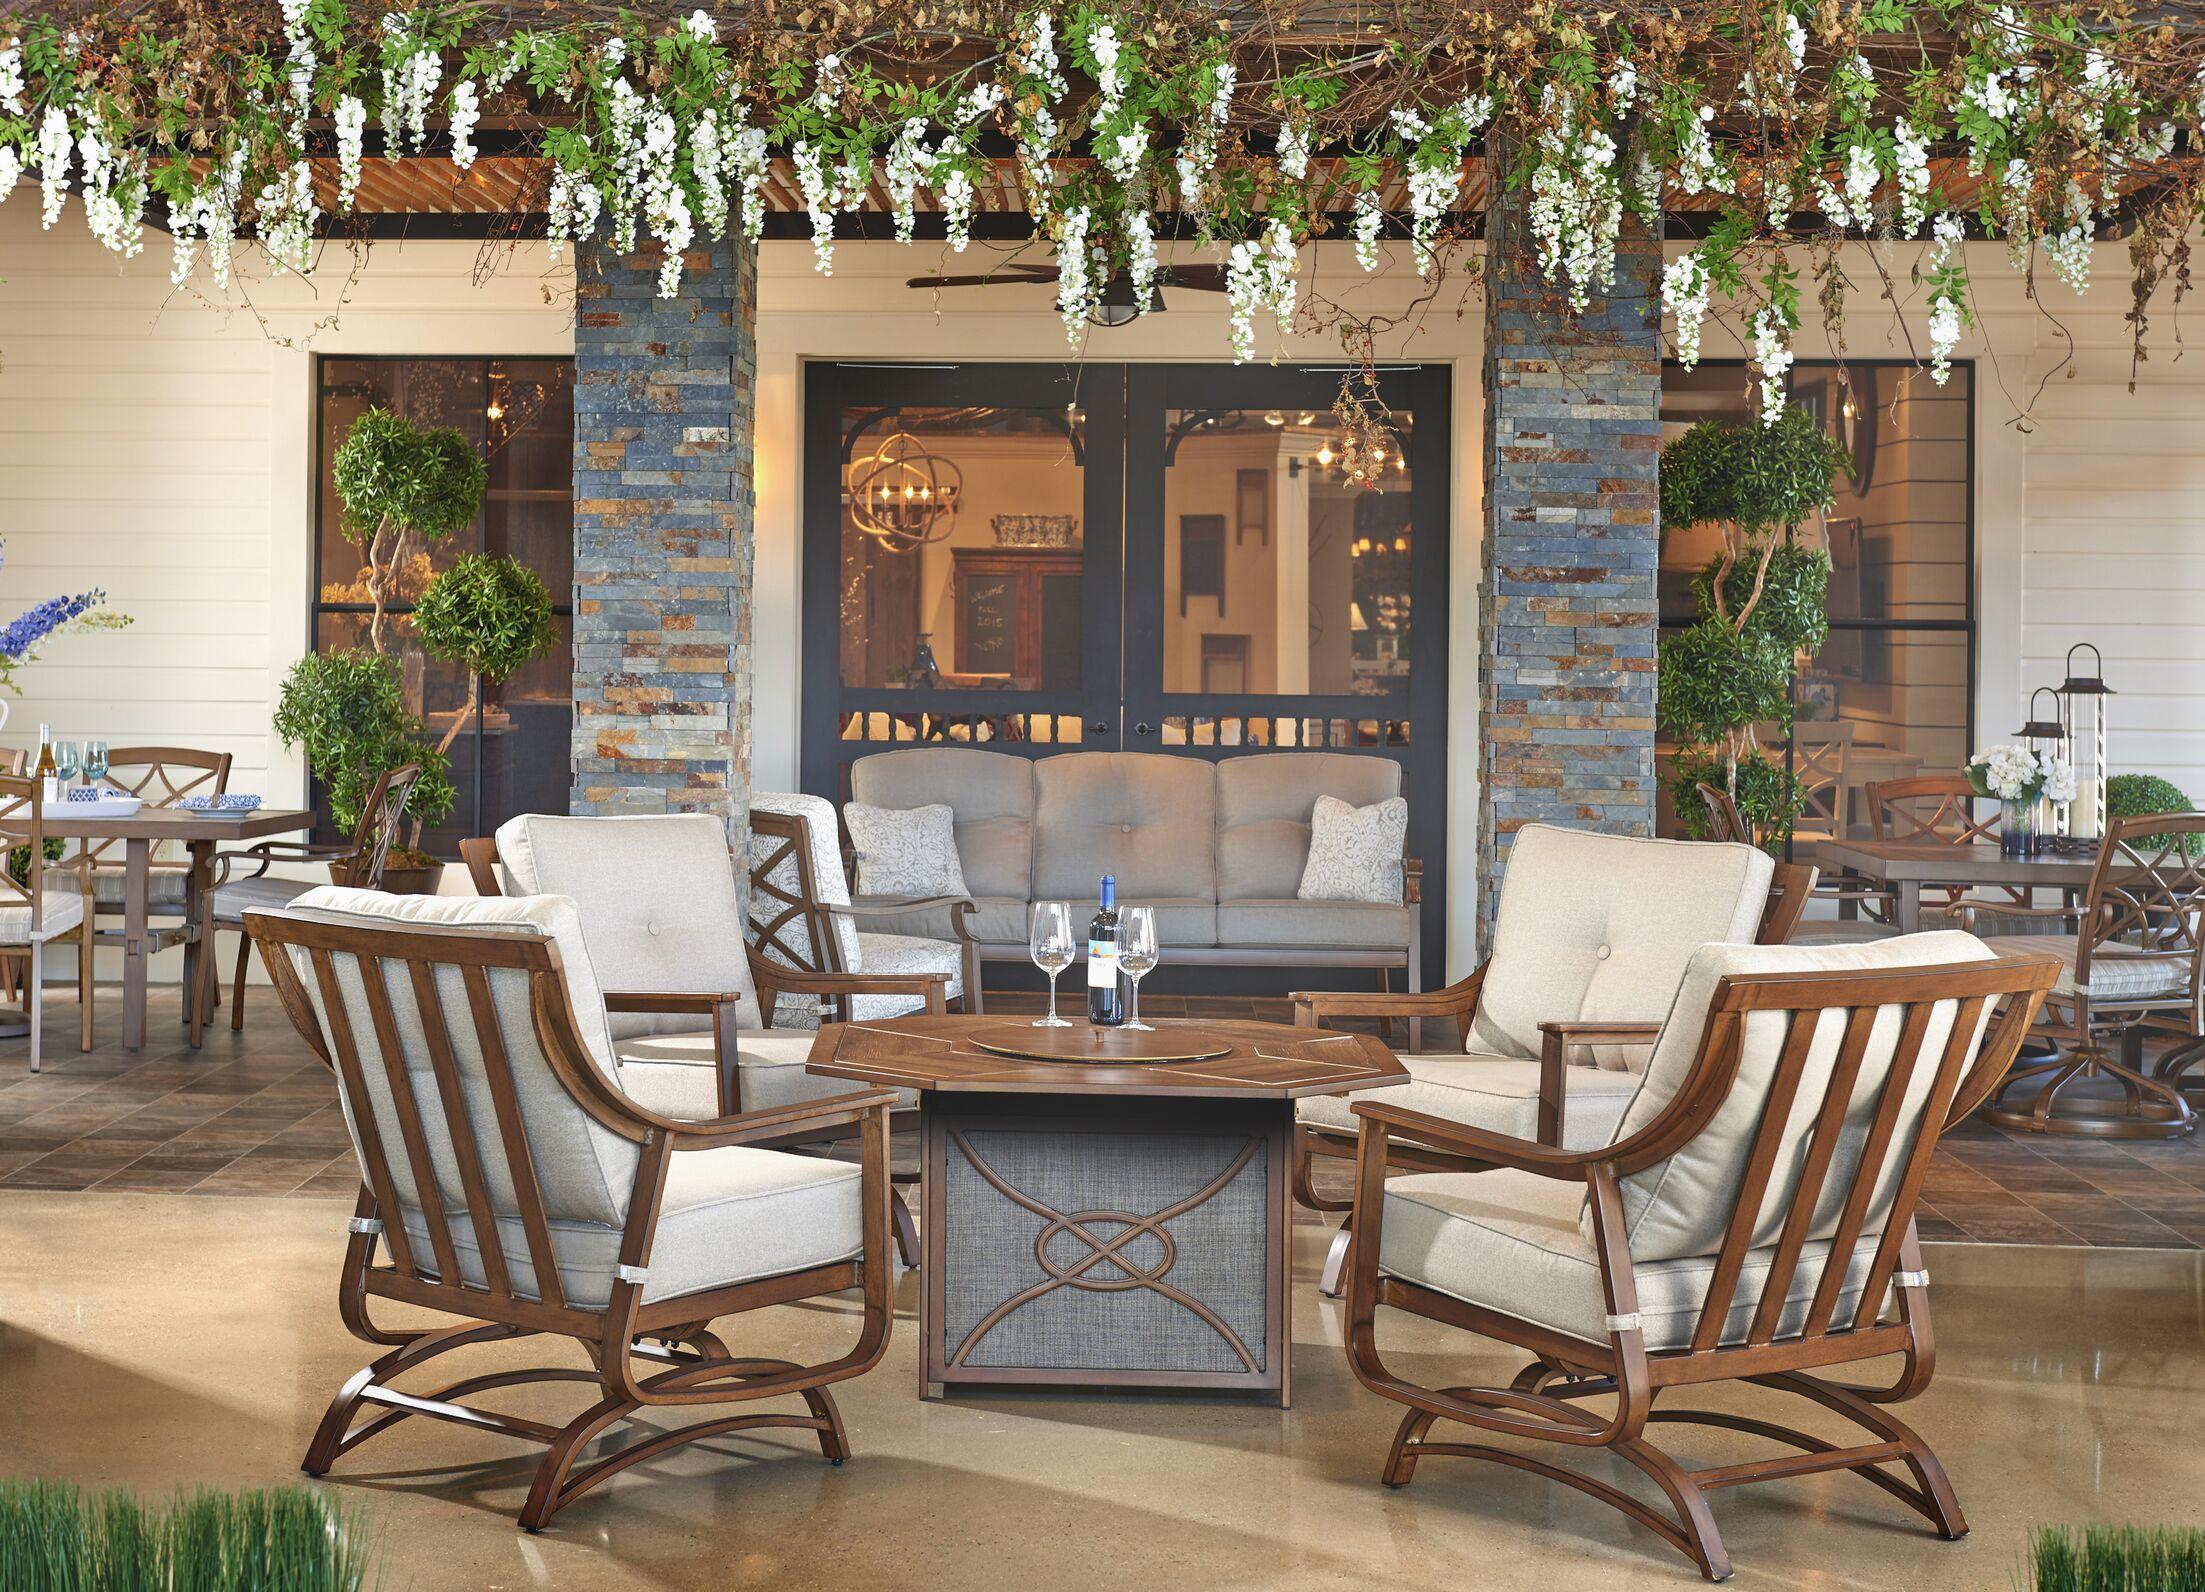 5 Piece Sunbrella Conversation Set with Cushions Fabric: Espadrille Driftwood